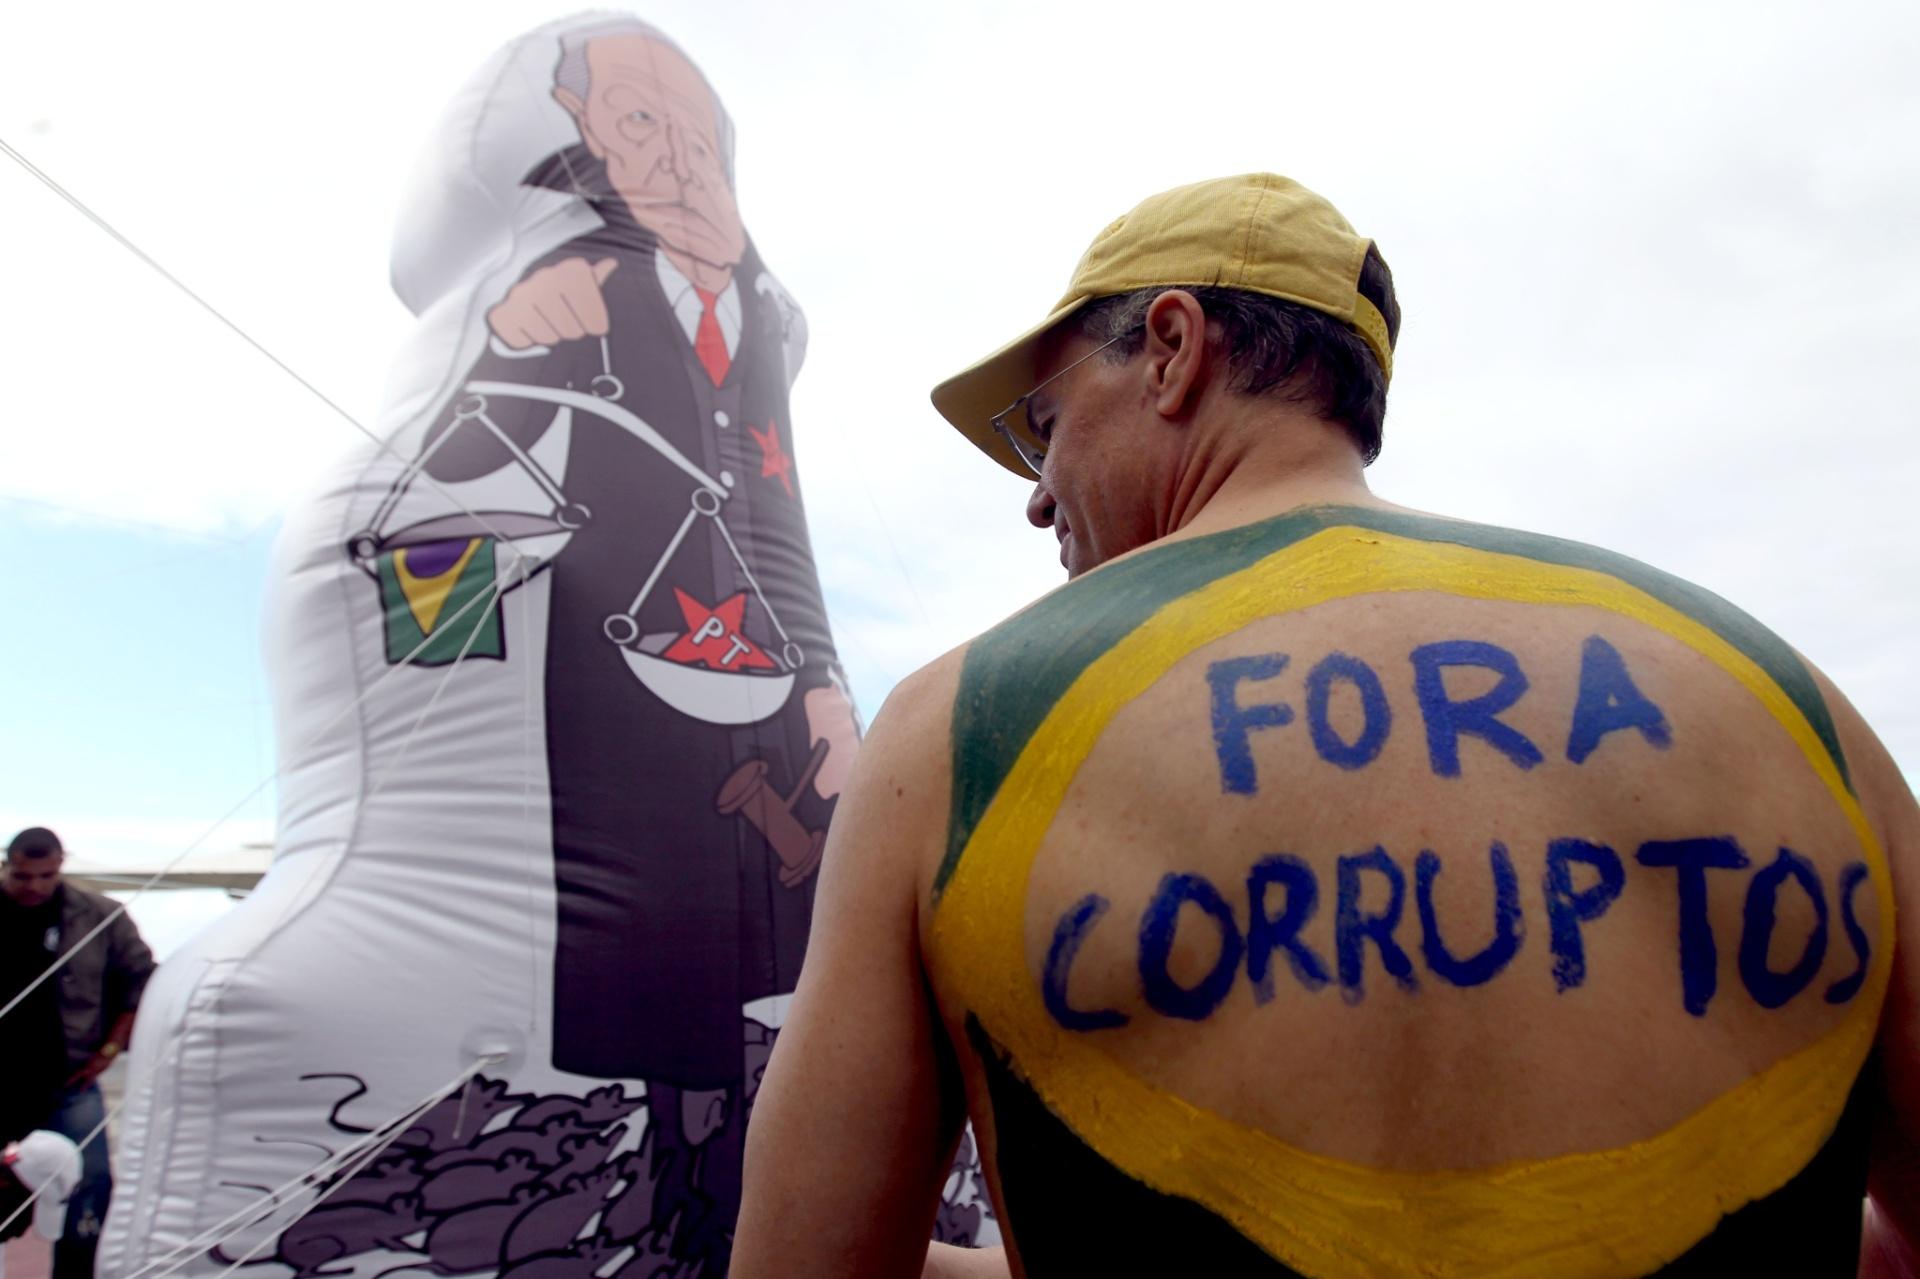 31.jul.2016 - Manifestantes pró-impeachment da presidente afastada Dilma Rousseff realizam protesto na orla de Copacabana, zona sul do Rio de Janeiro